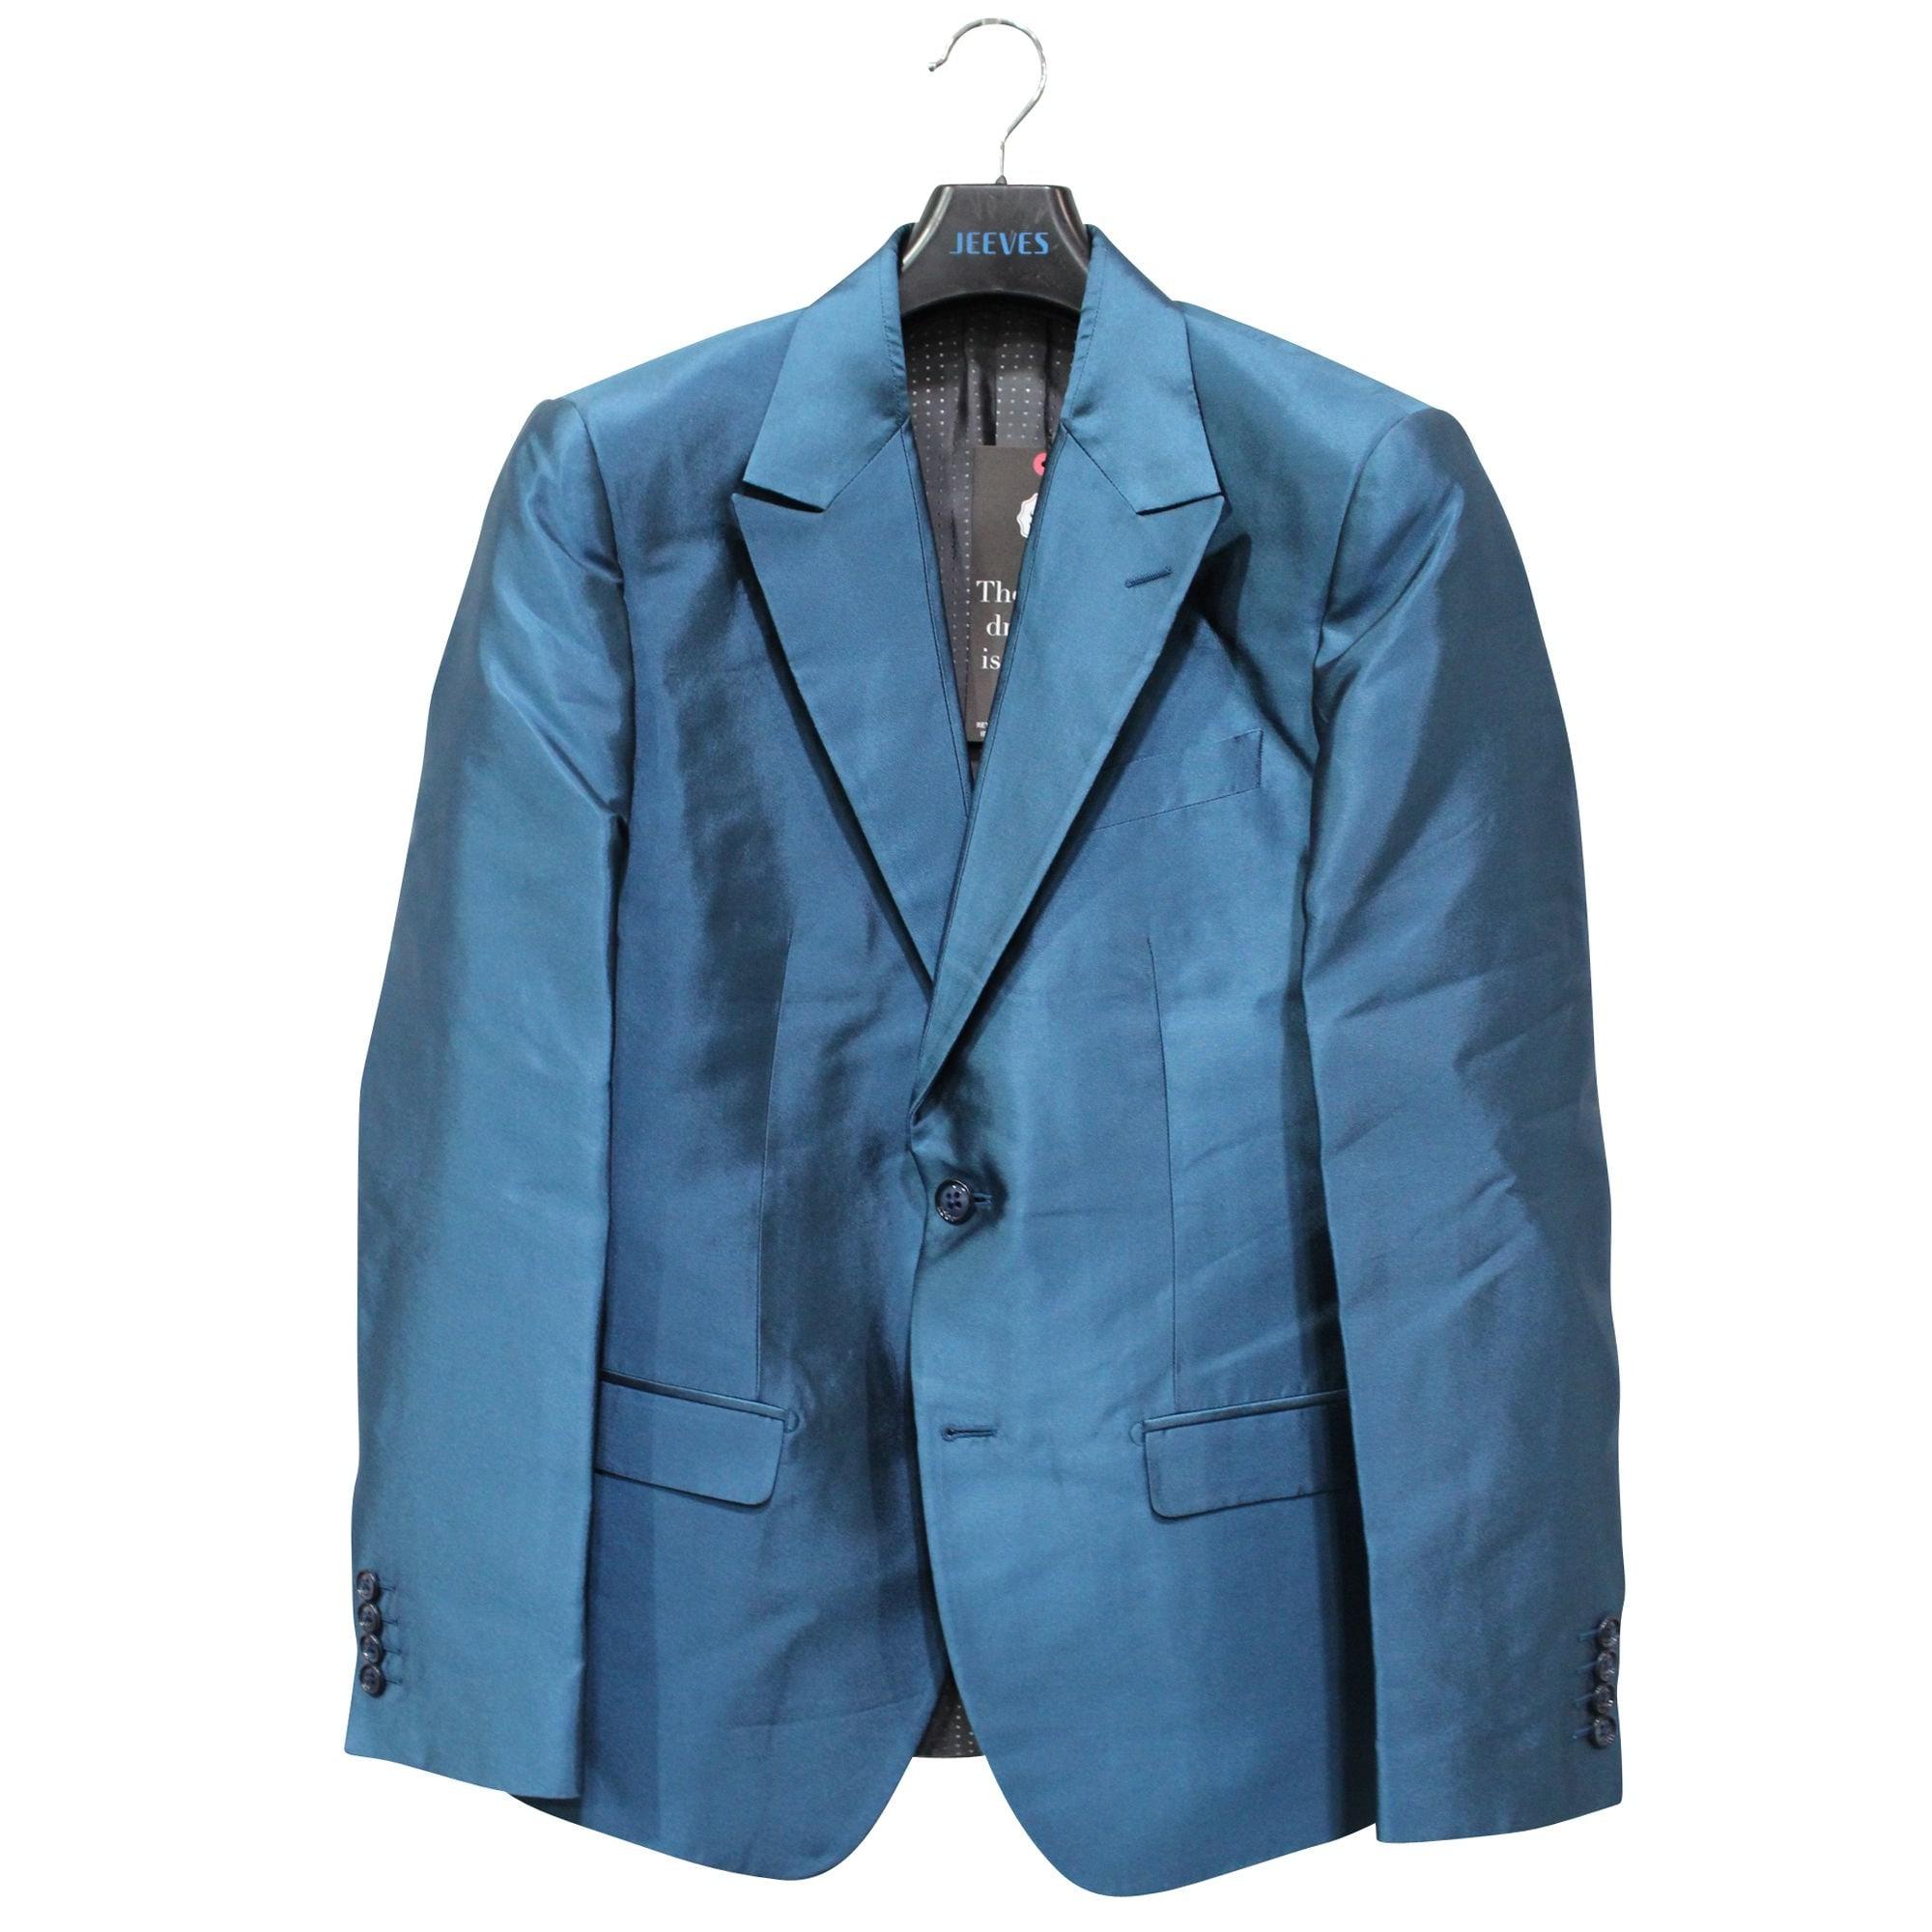 Veste DOLCE & GABBANA Bleu, bleu marine, bleu turquoise